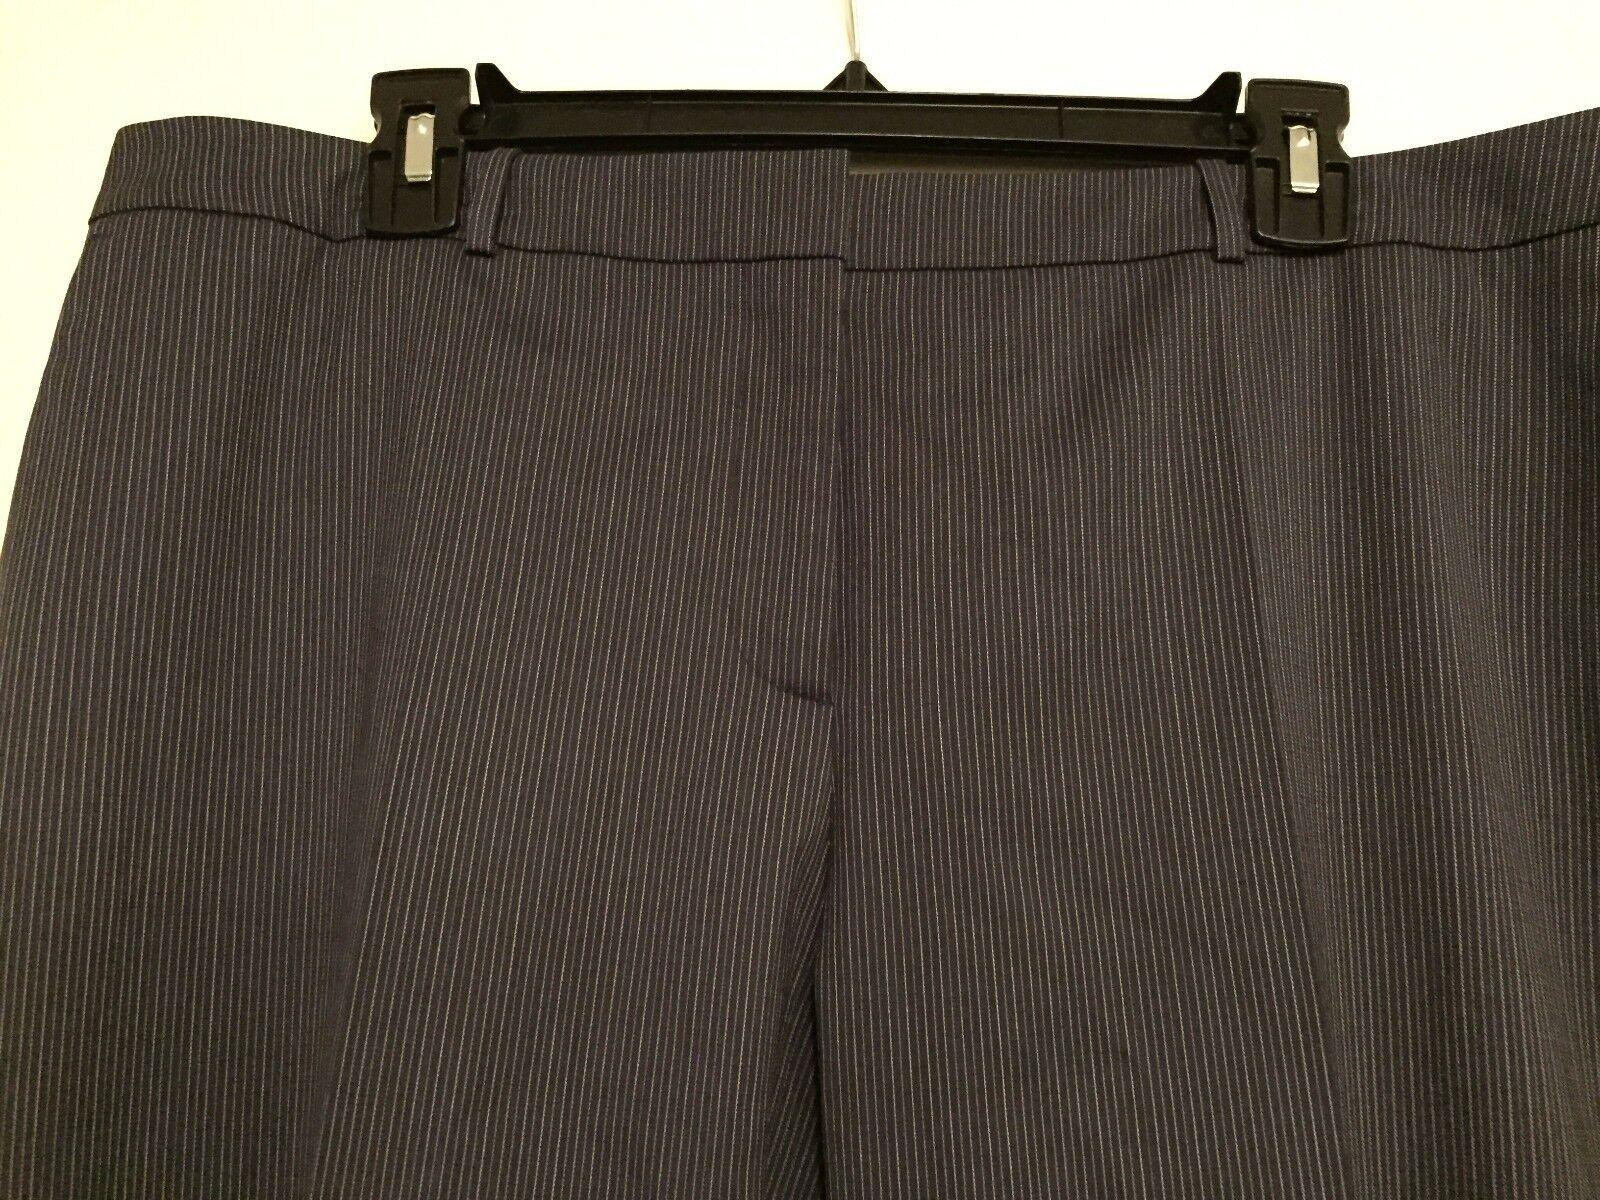 NWT Boss by Hugo Boss Tamea1 Trouser Pants Navy White Pinstripe  285 – 12